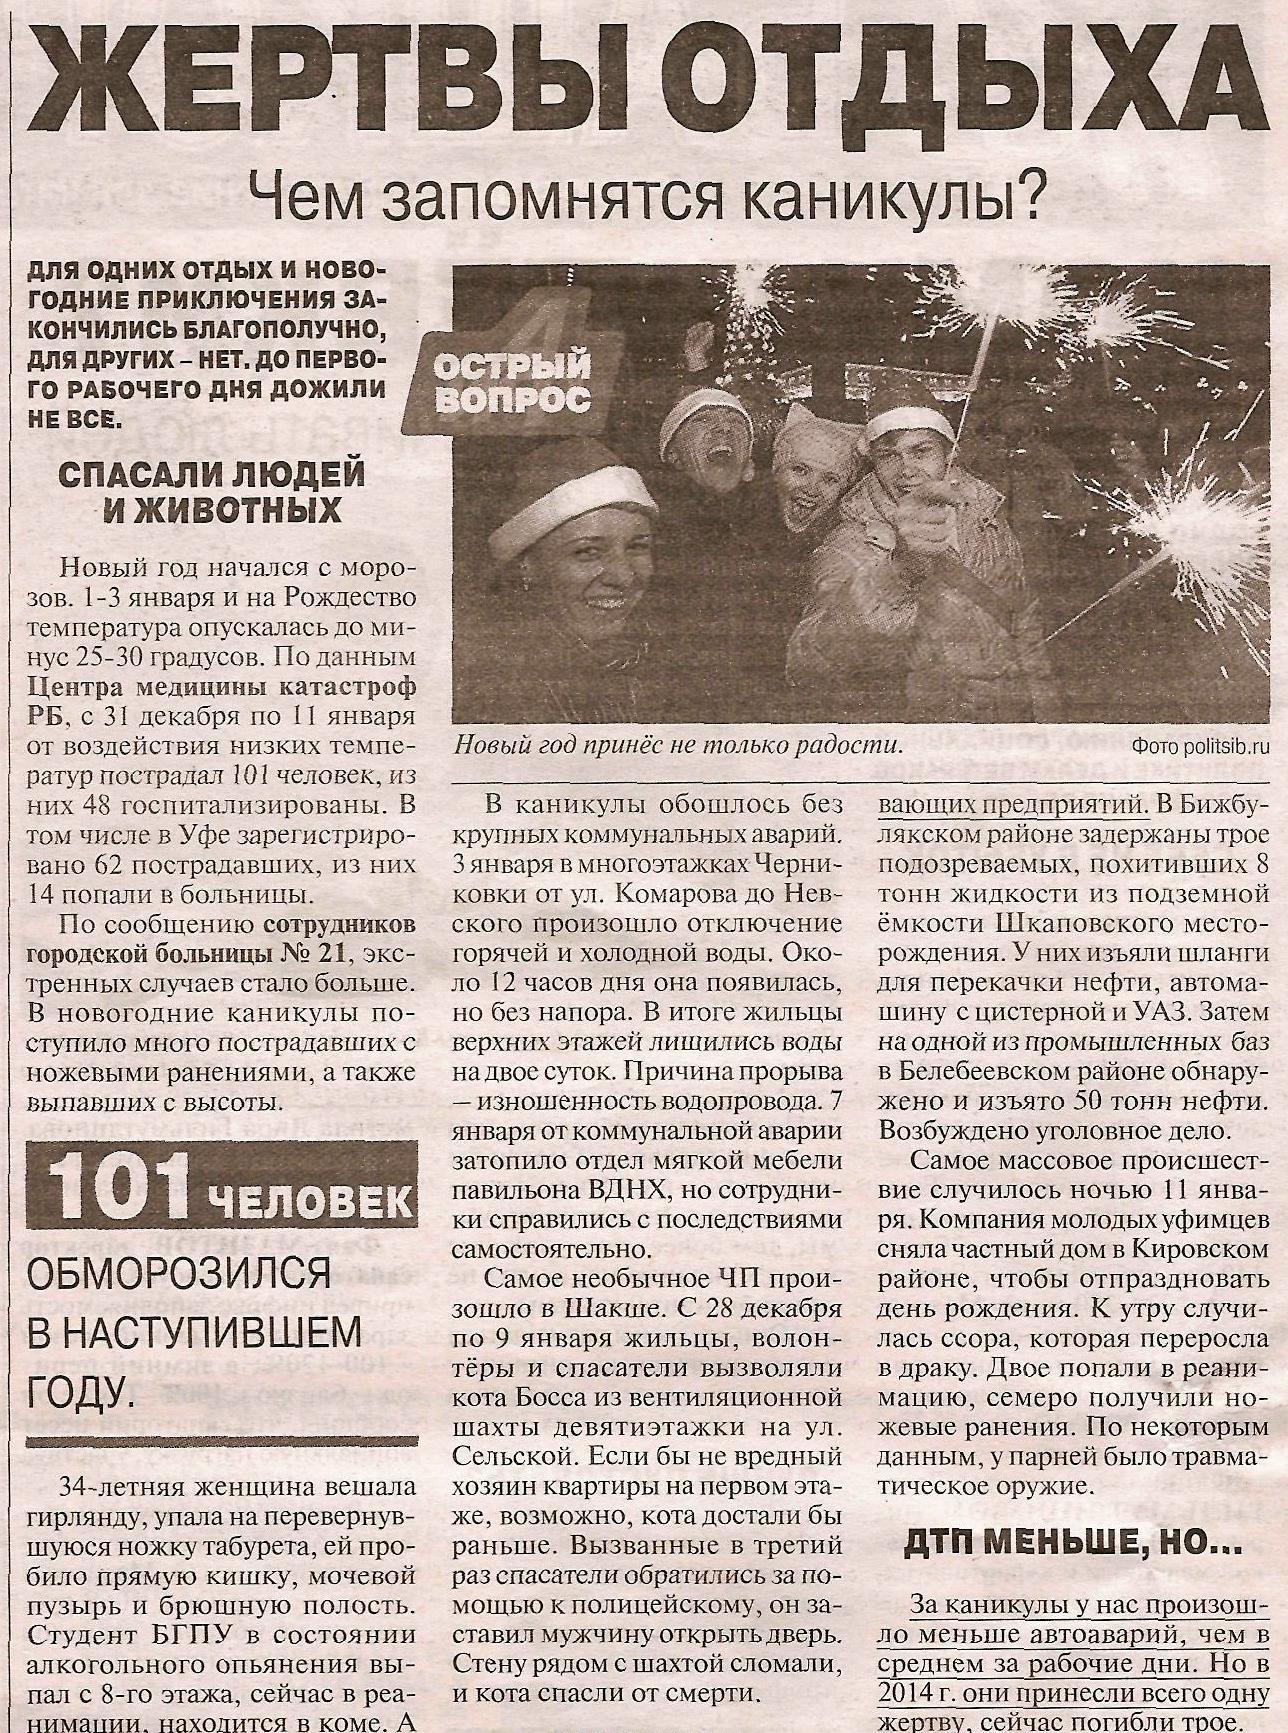 Аргументы и факты №3 14-20.01.15 Жертвы отдыха